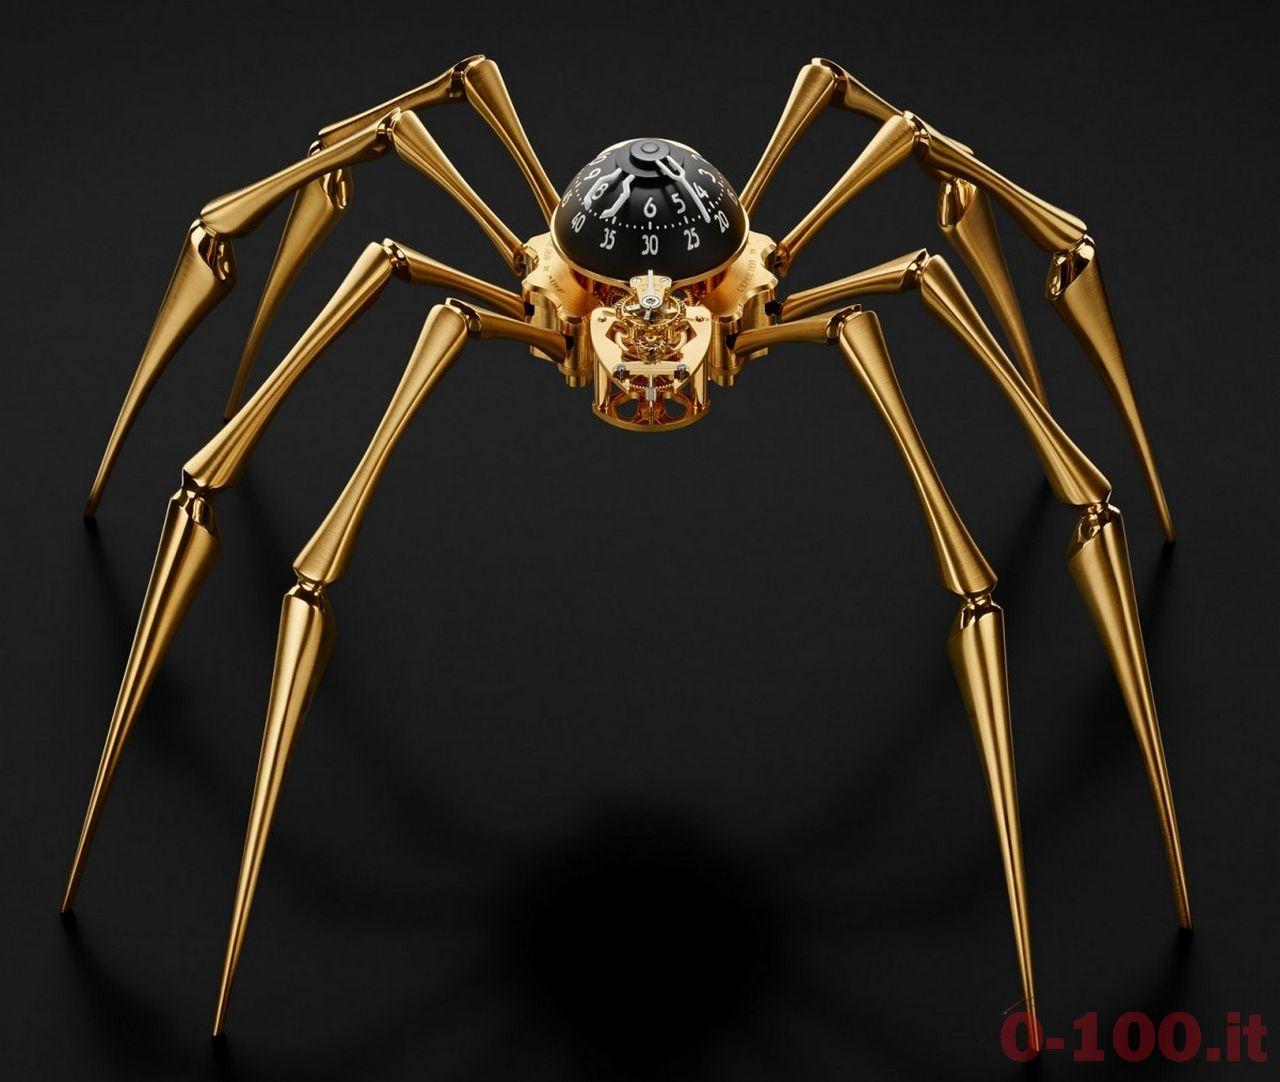 mbf-arachnophobia-lepee-1839_0-1005